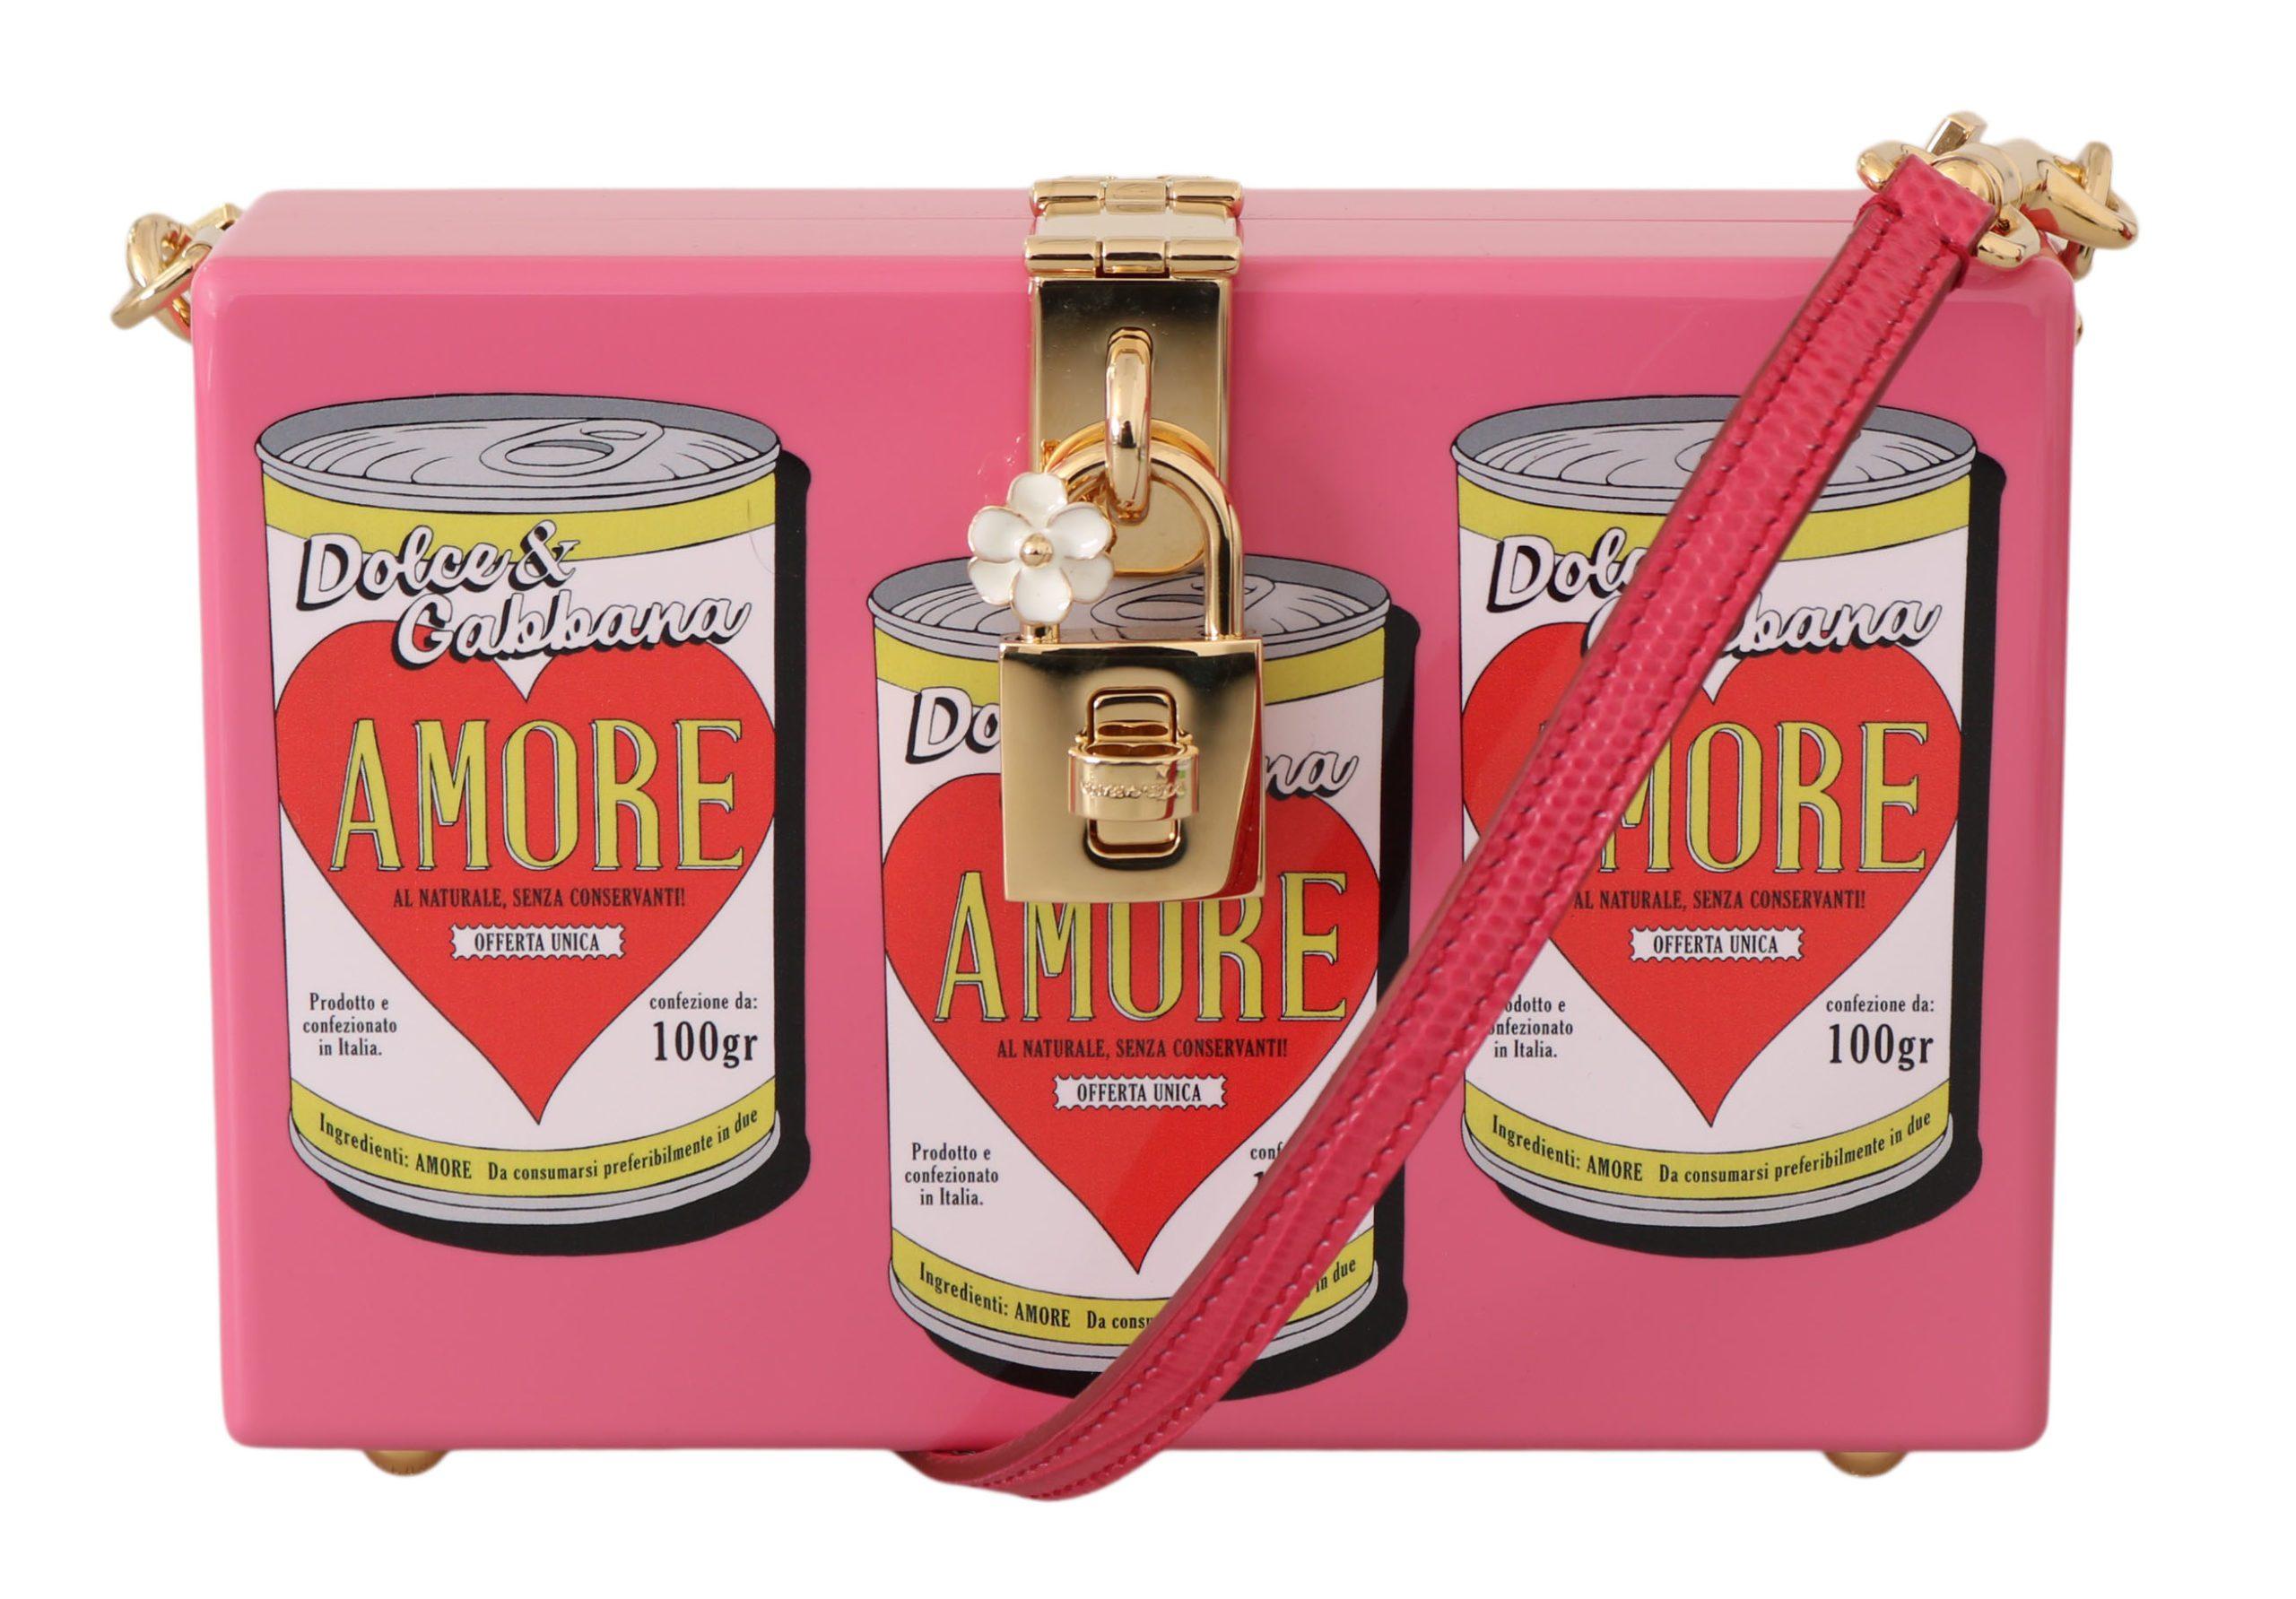 Dolce & Gabbana Women's Clutch Box Wooden AMORE Shoulder Bag Pink VA1052